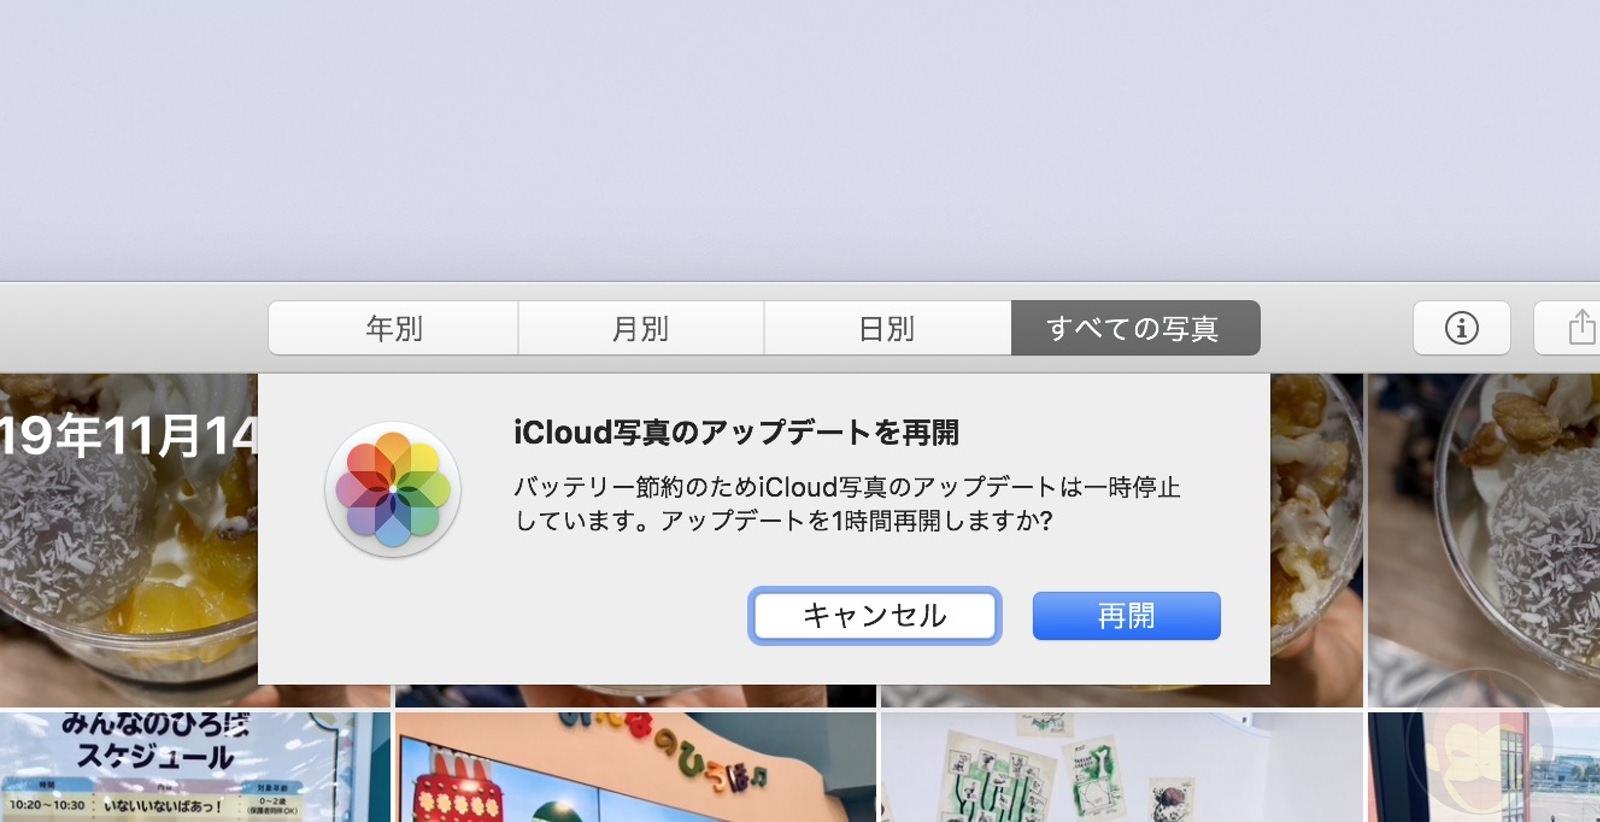 No-charging-no-uploads-2-00.jpg